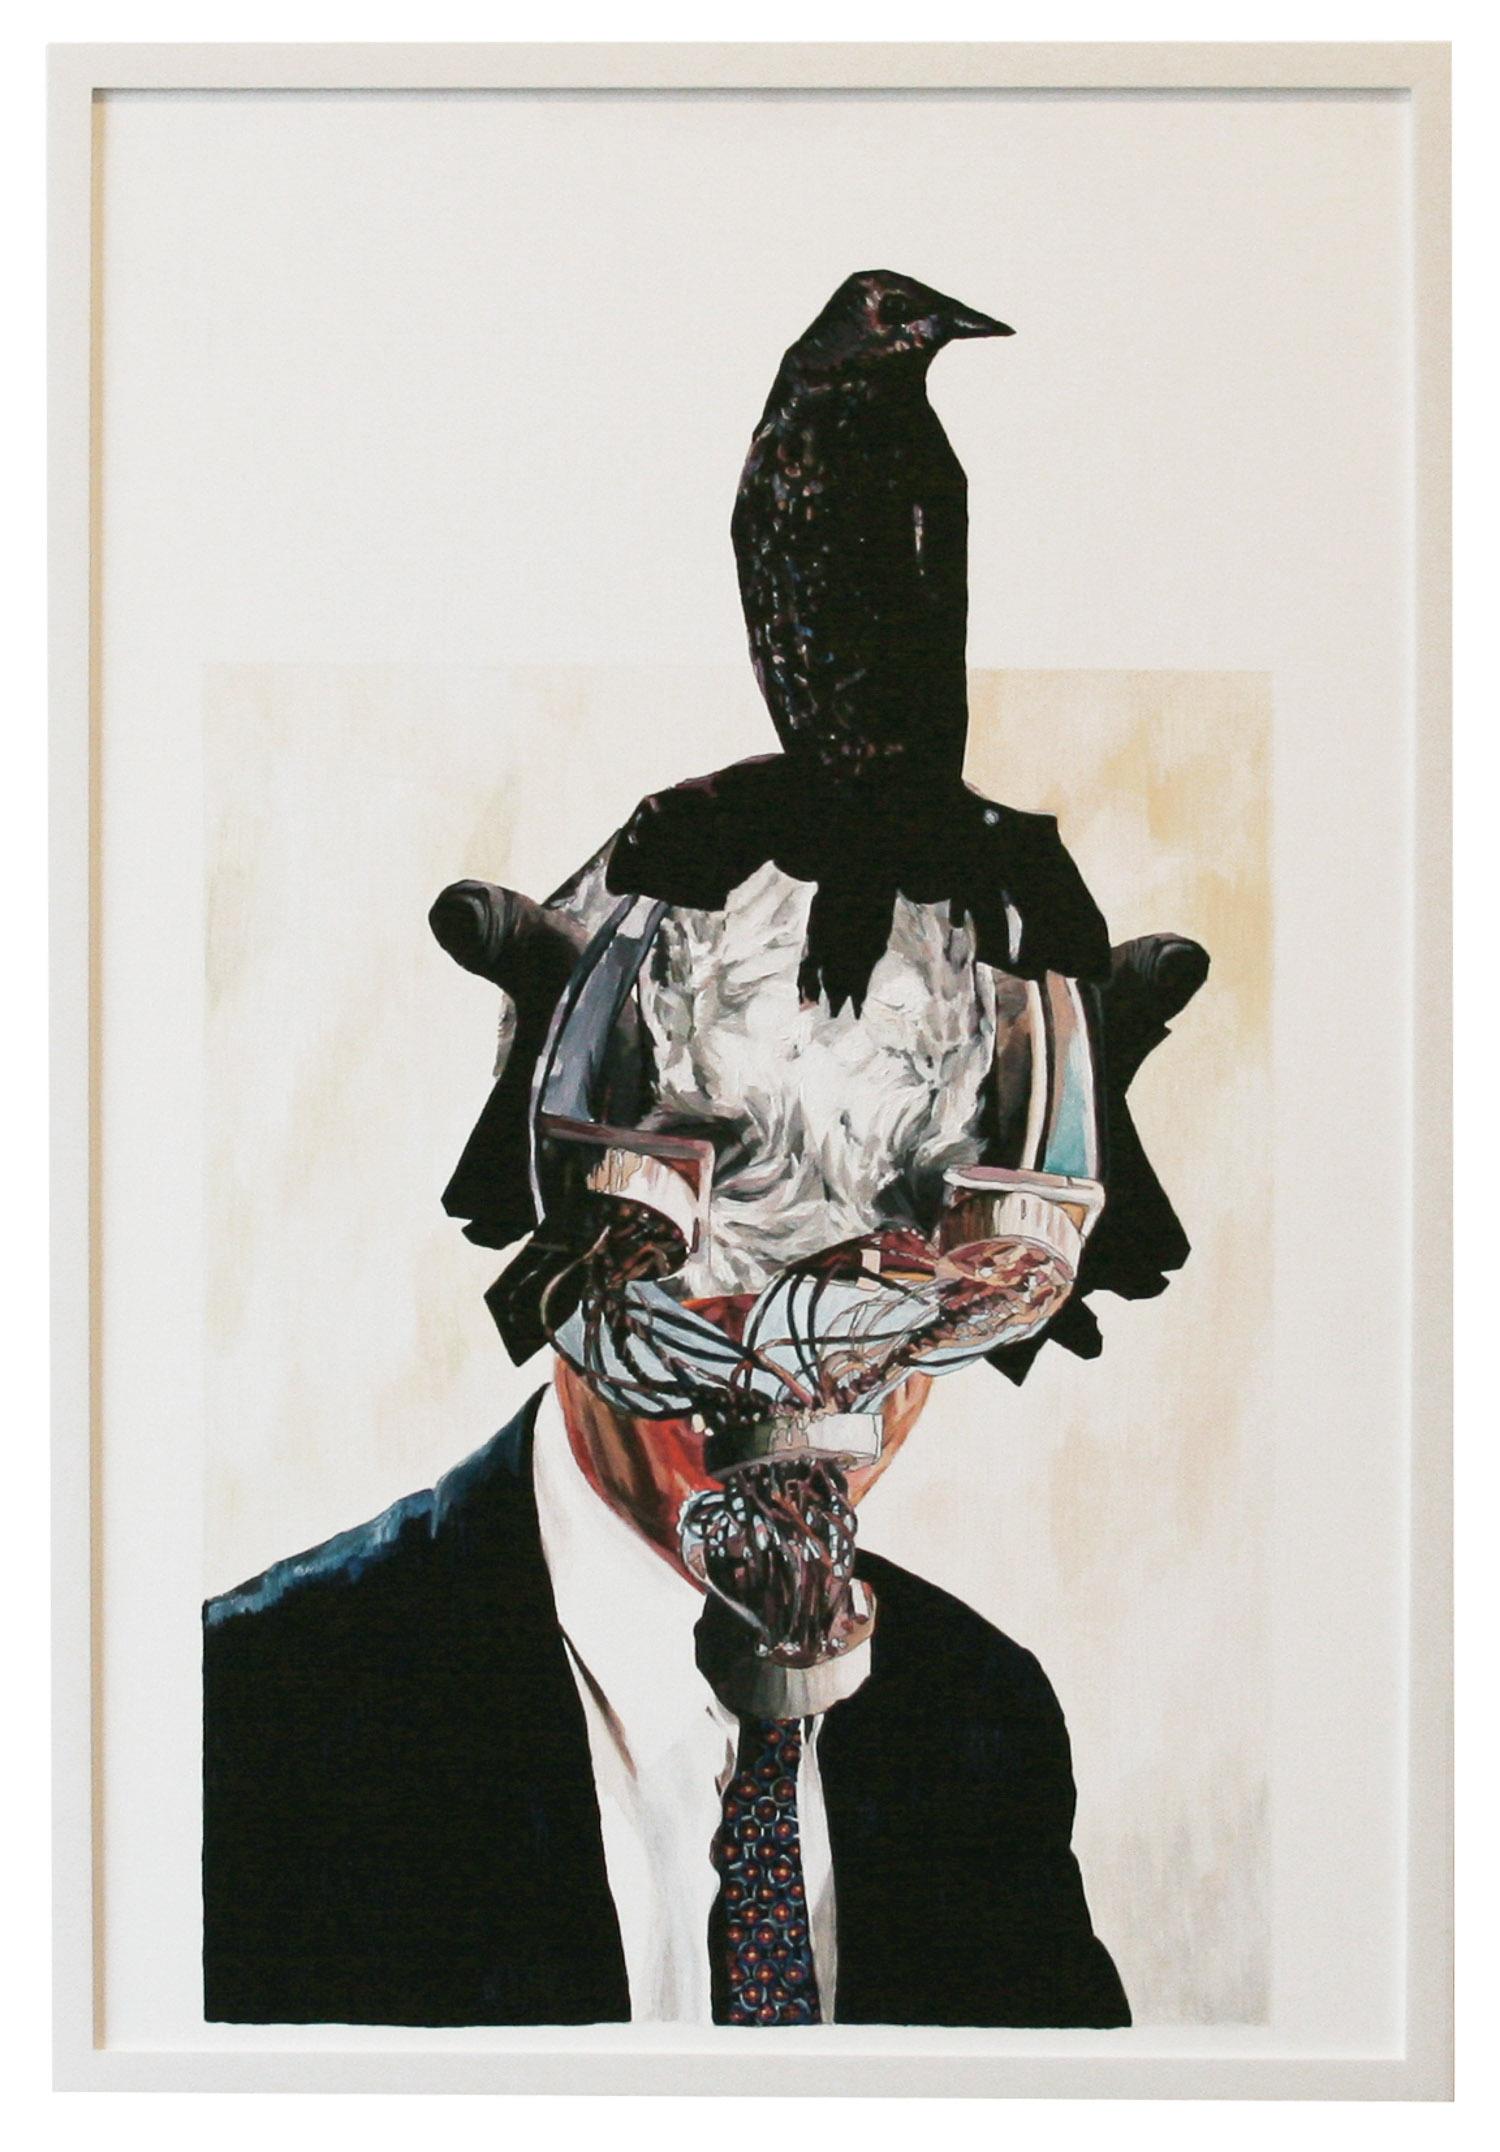 MC With Bird, 2010